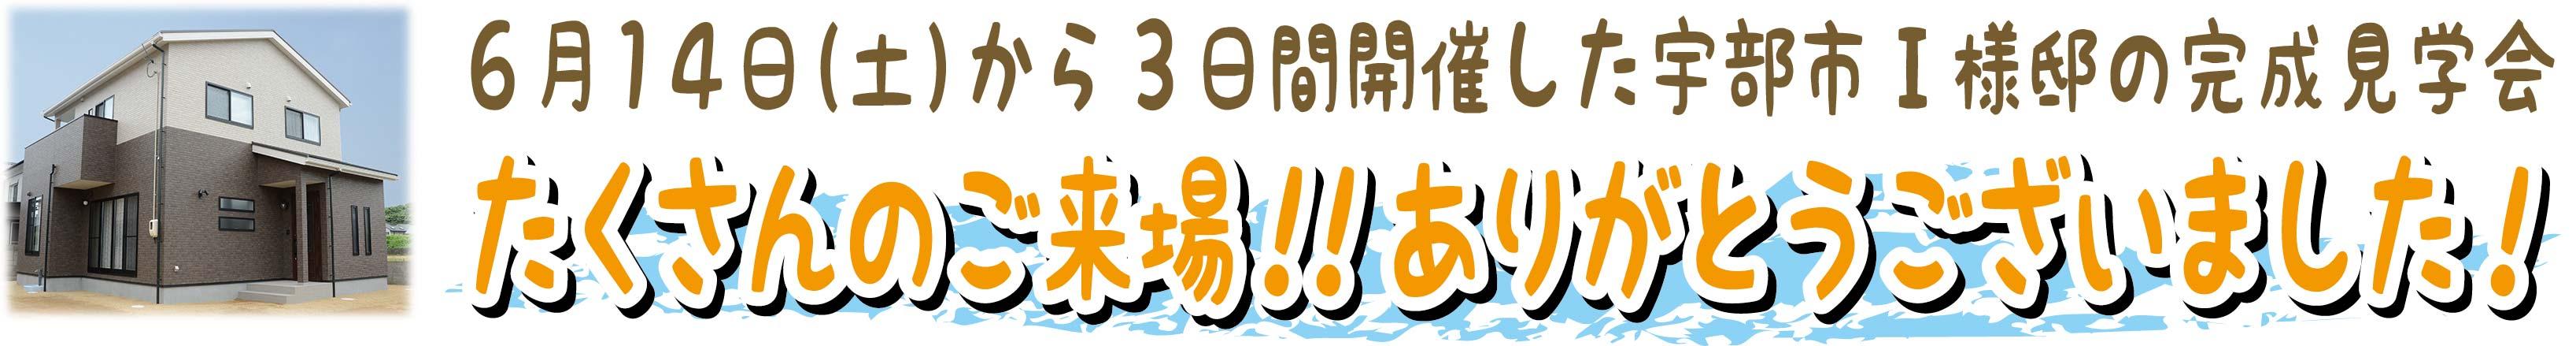 KuraSi-natu-sin85-07.jpg